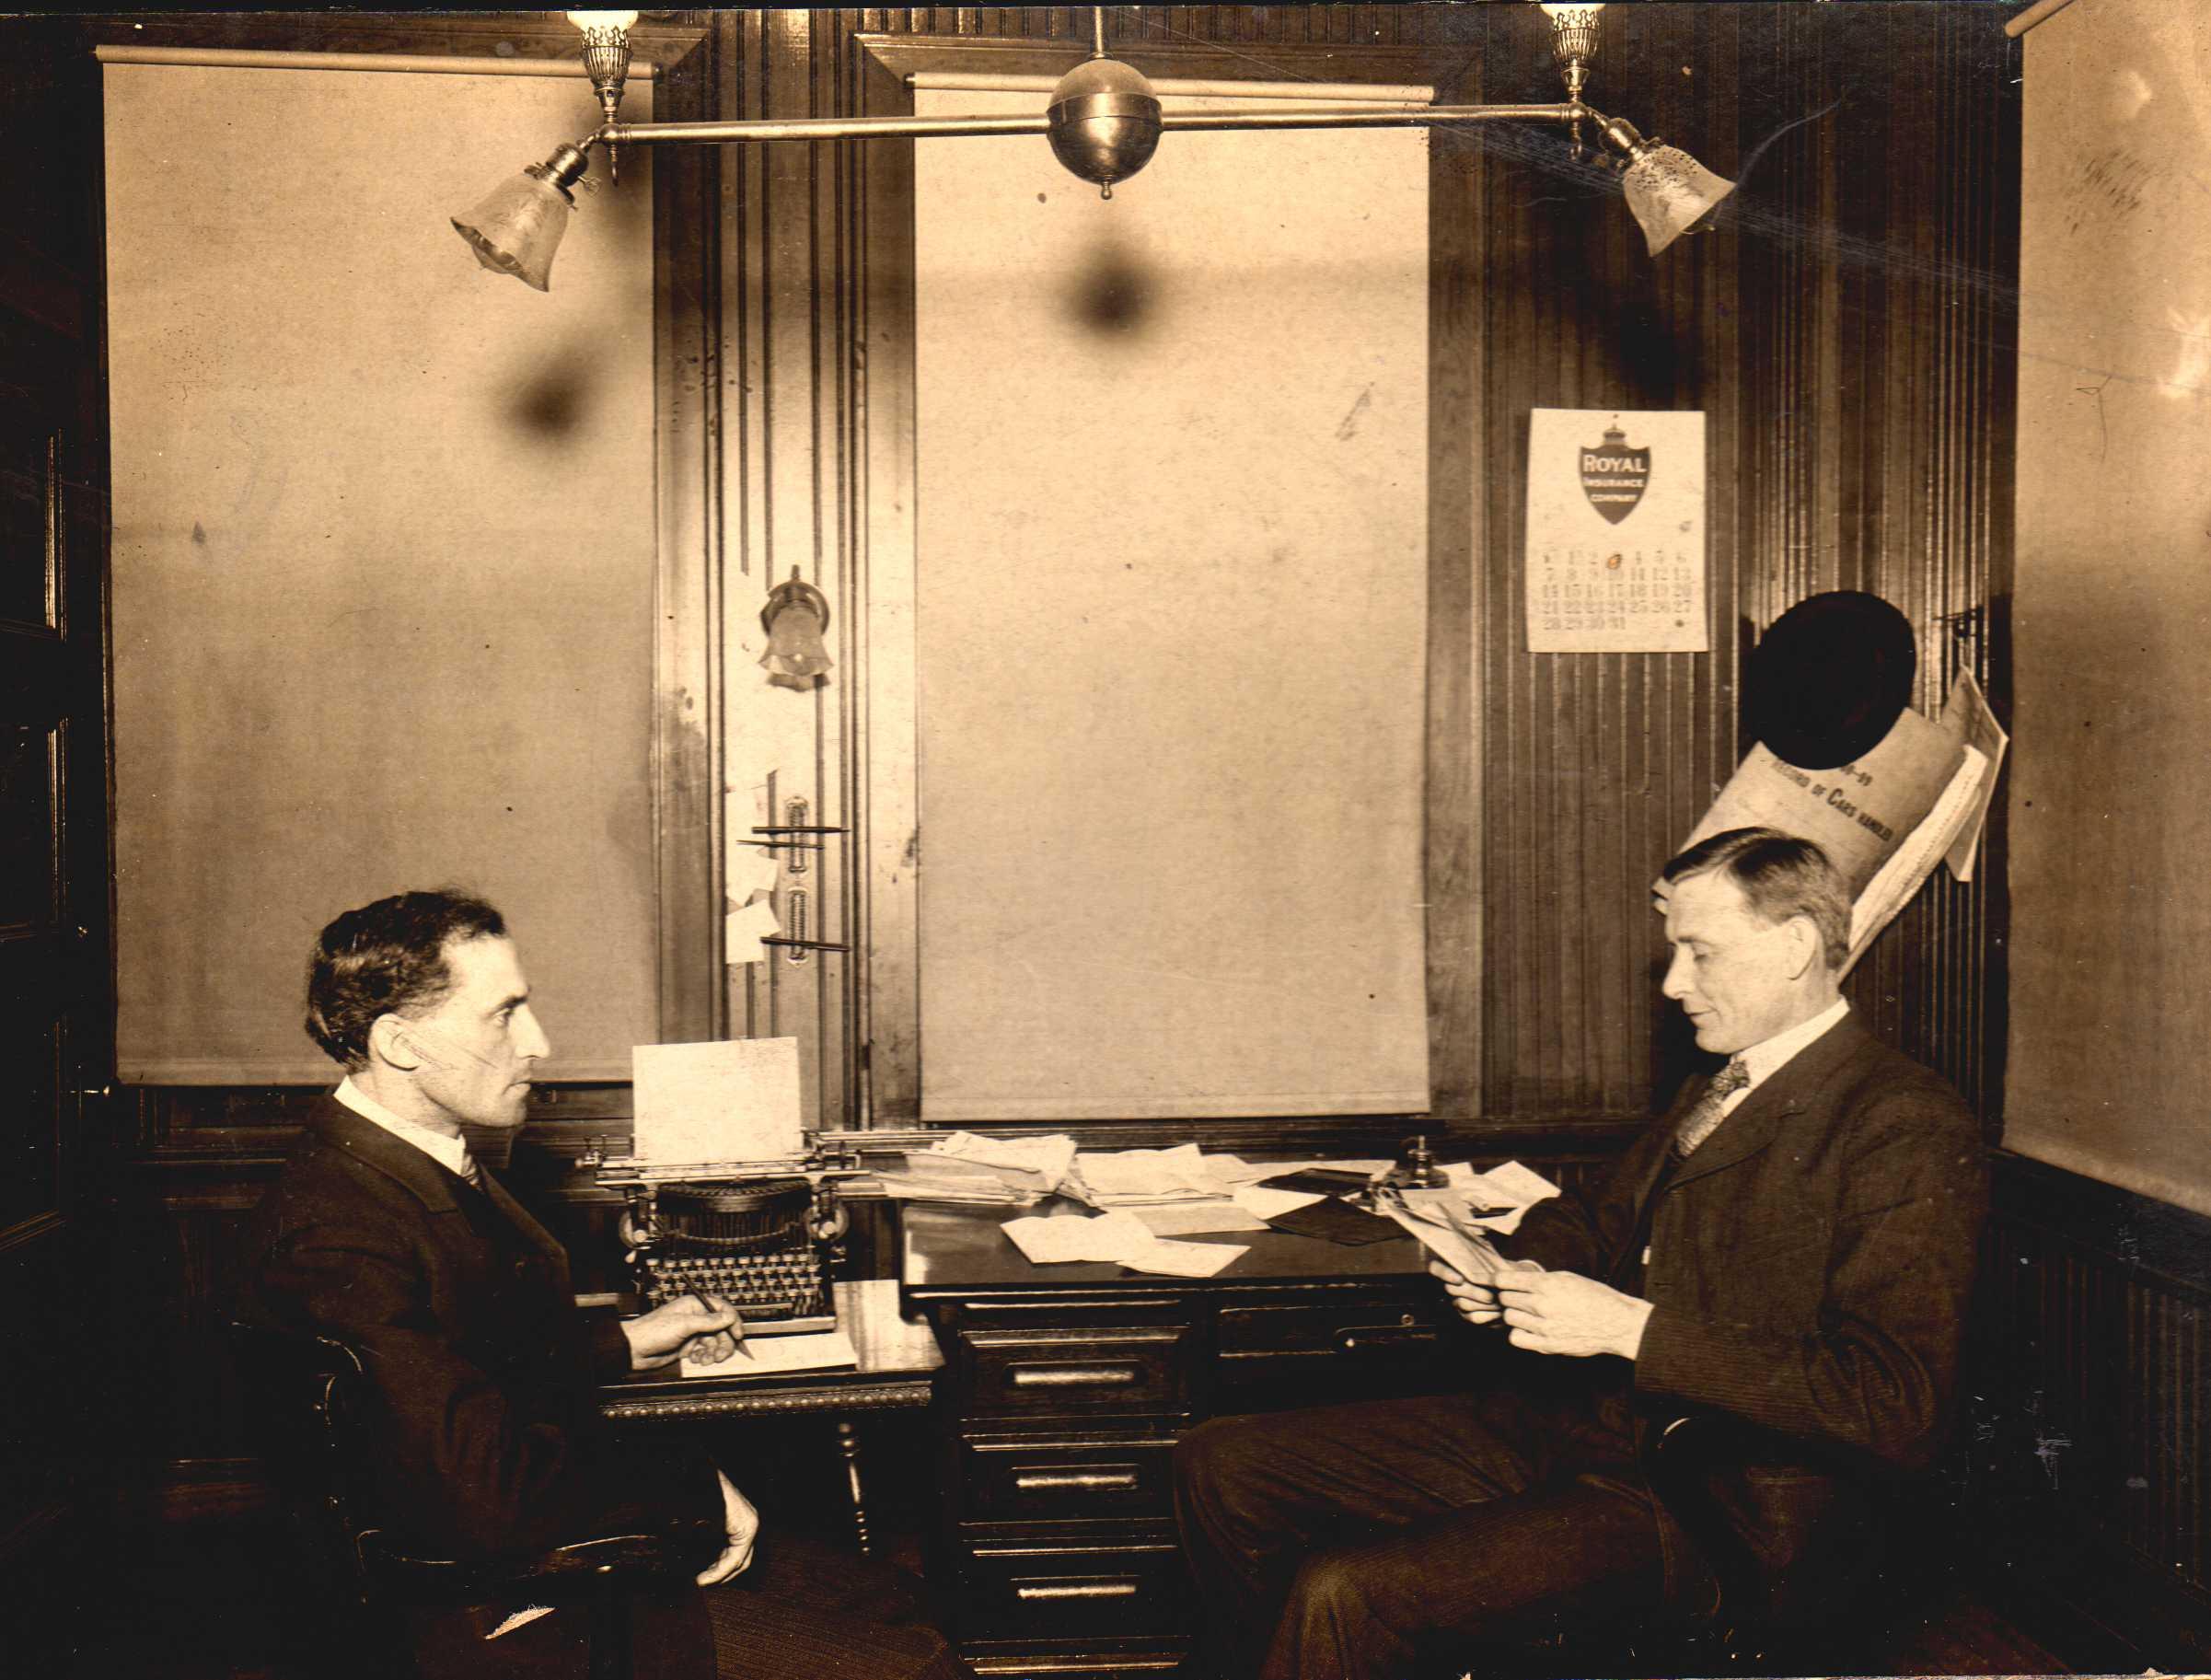 1899 CORAOPOLIS TRAIN STATION 1.jpg